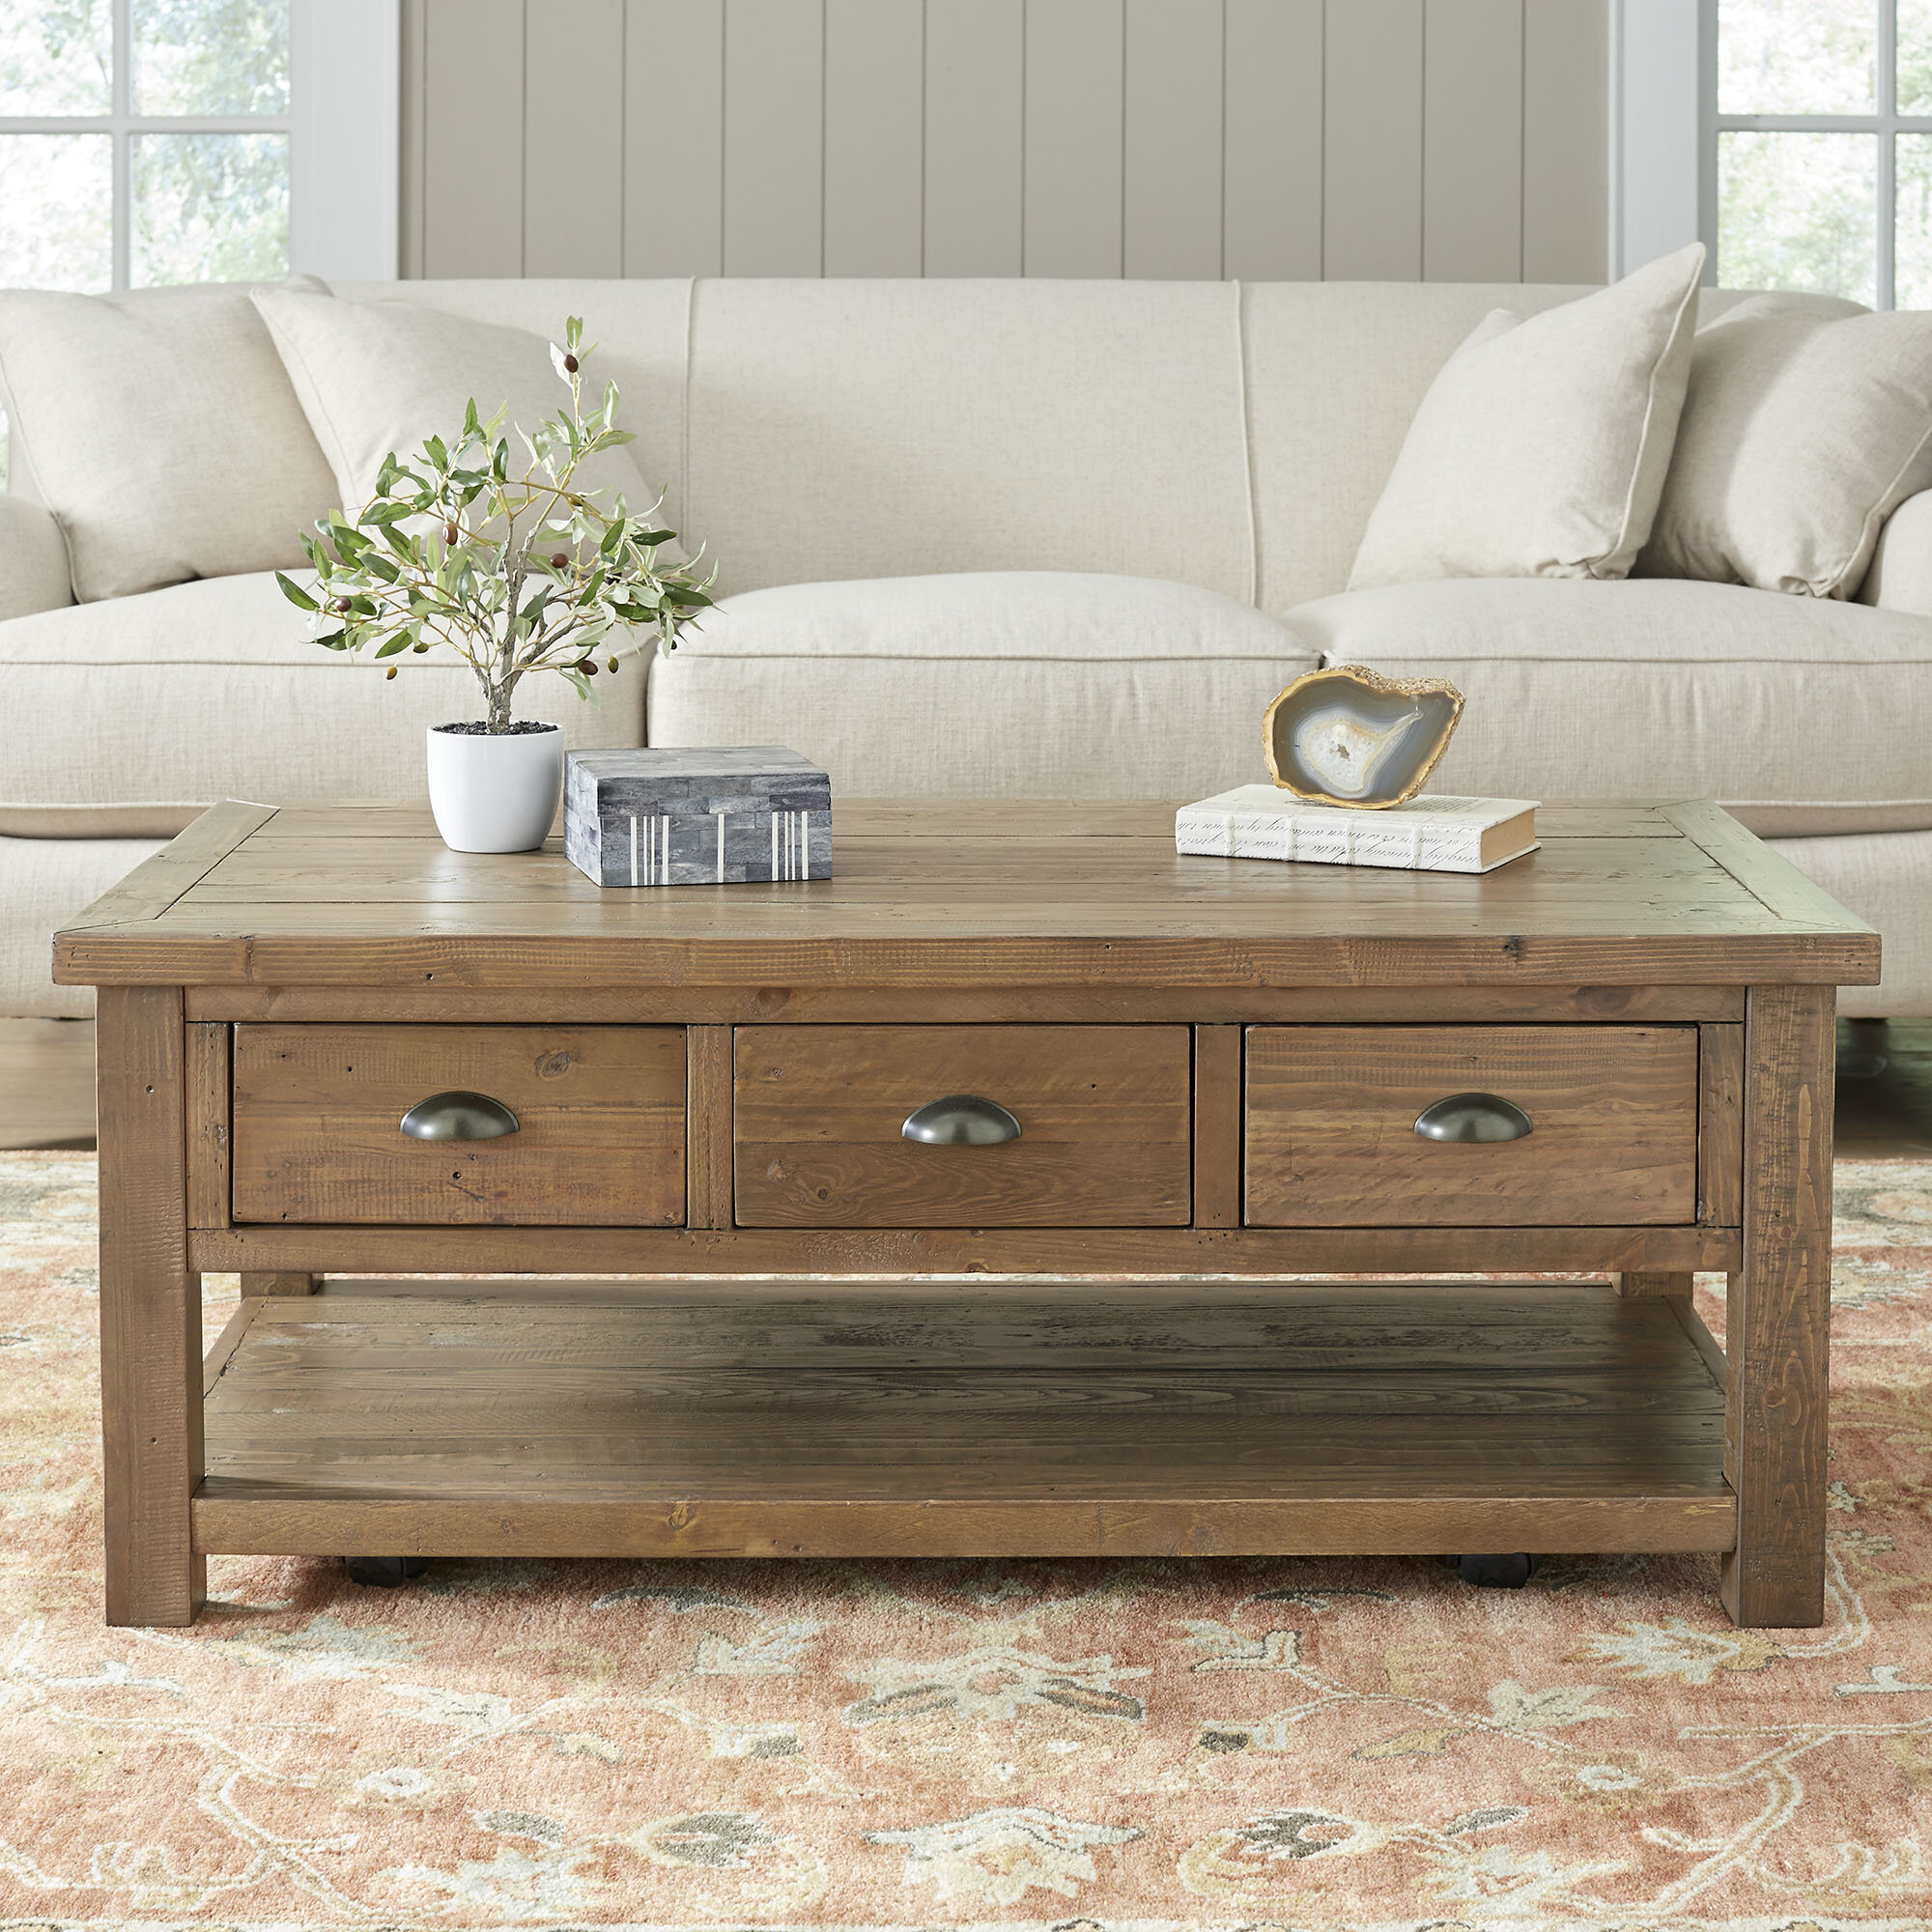 Birch Lane Seneca Coffee Table Reviews Birch Lane - Rectangle coffee table with drawers